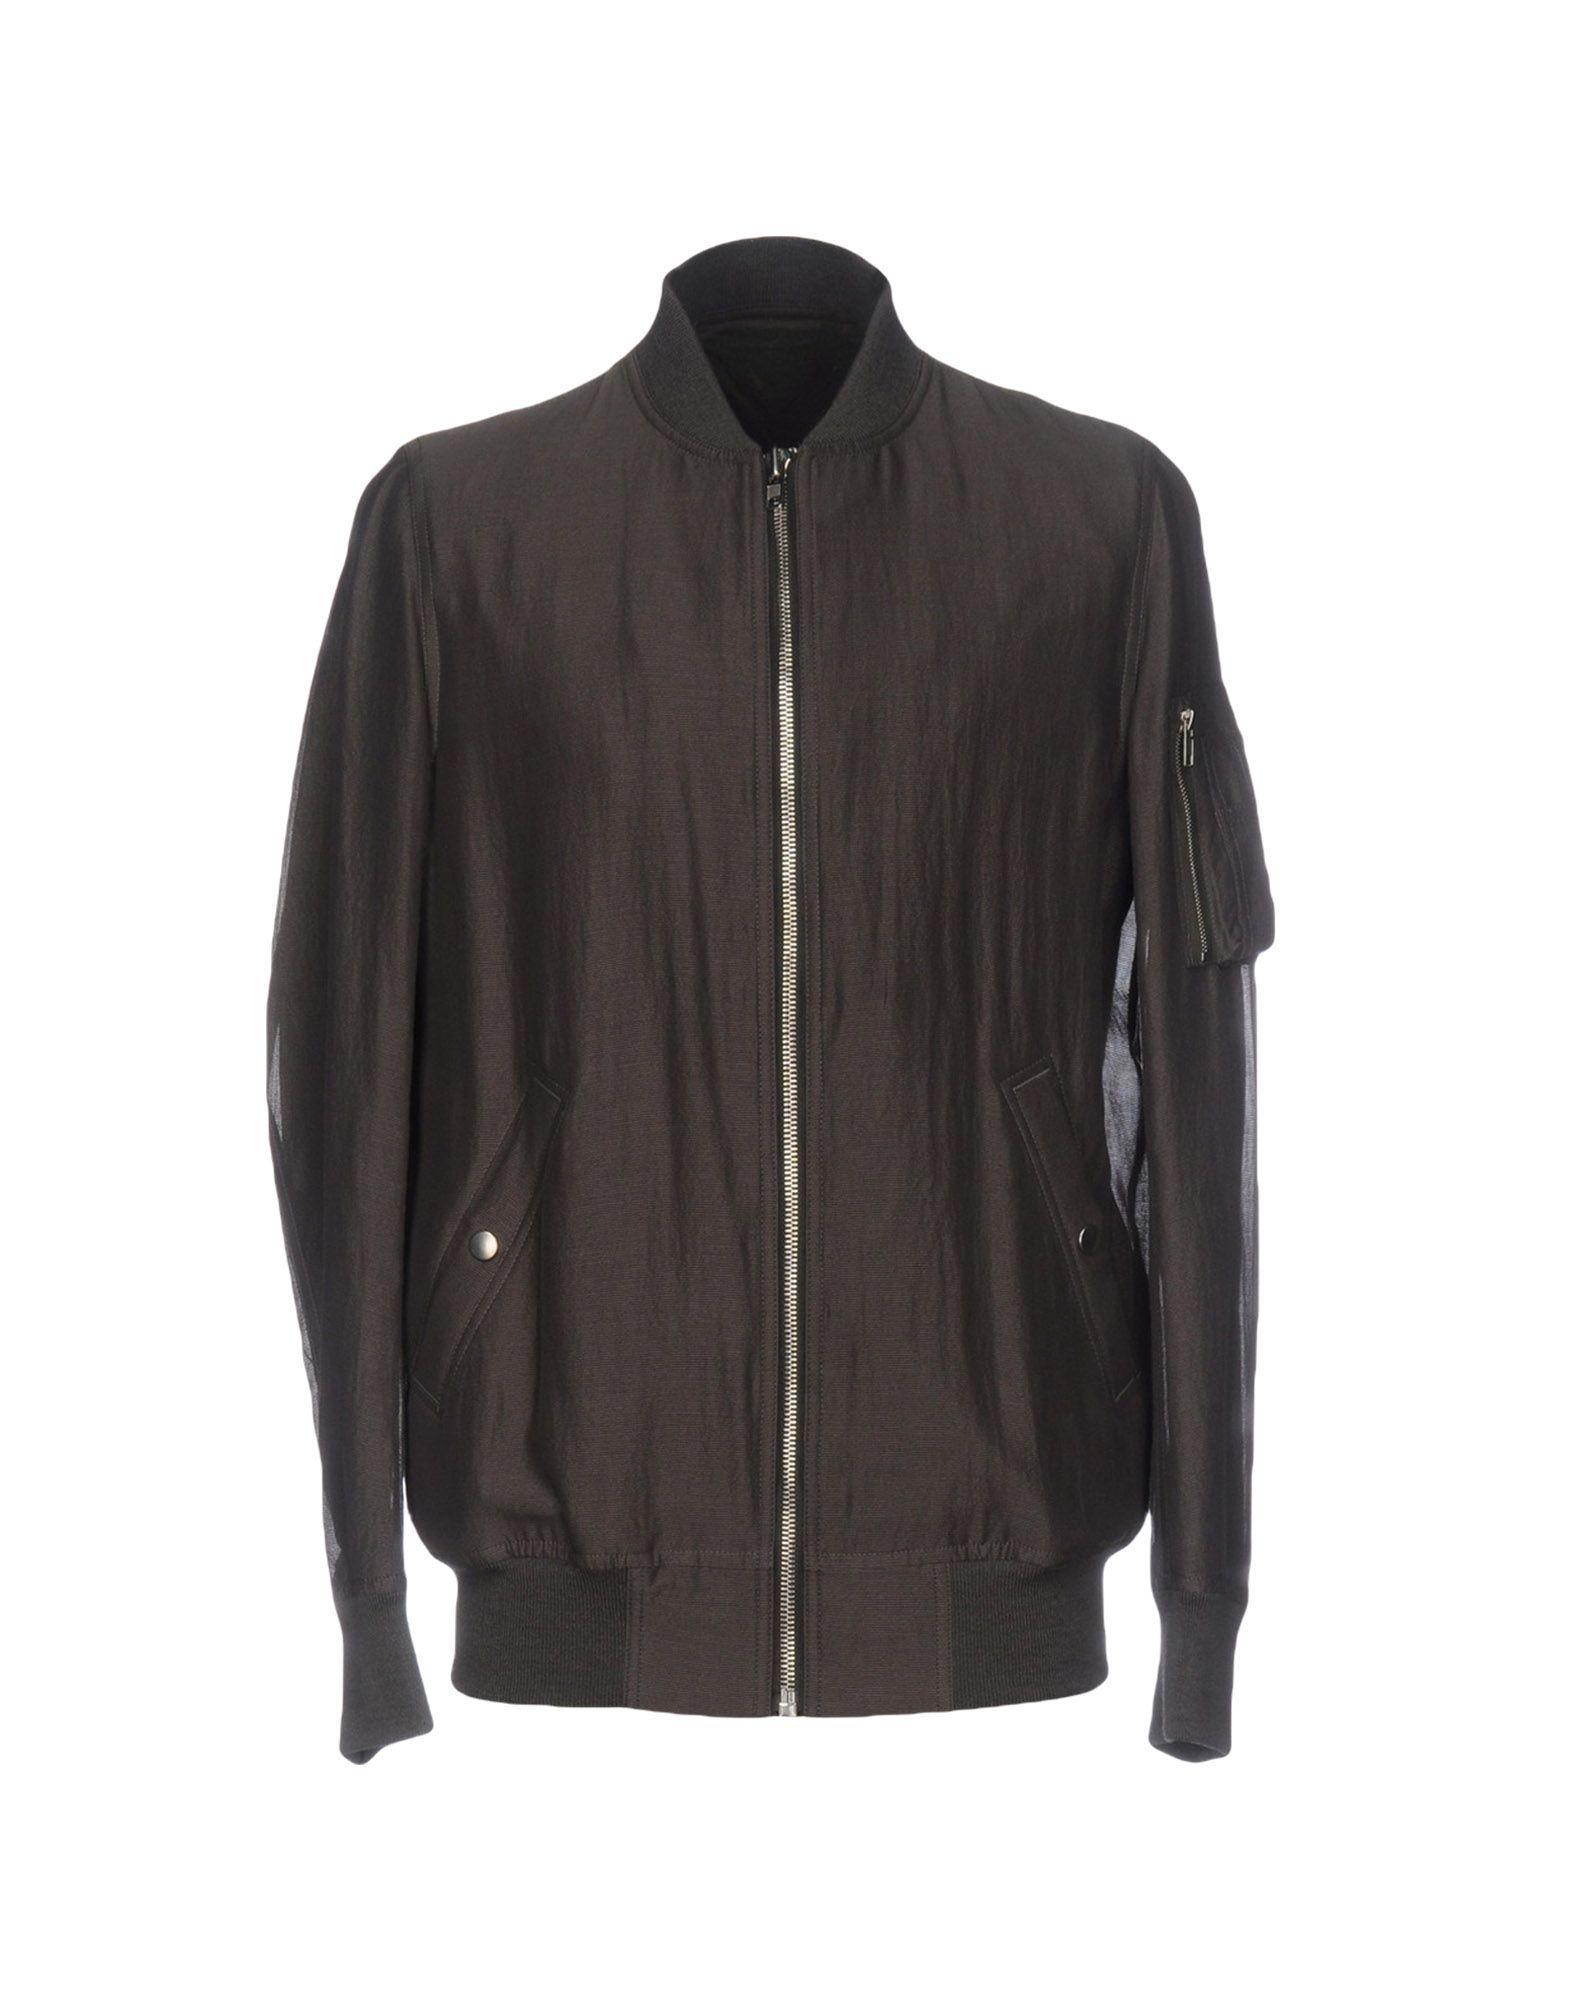 RICK OWENS JACKETS. rickowens cloth Rick owens jacket